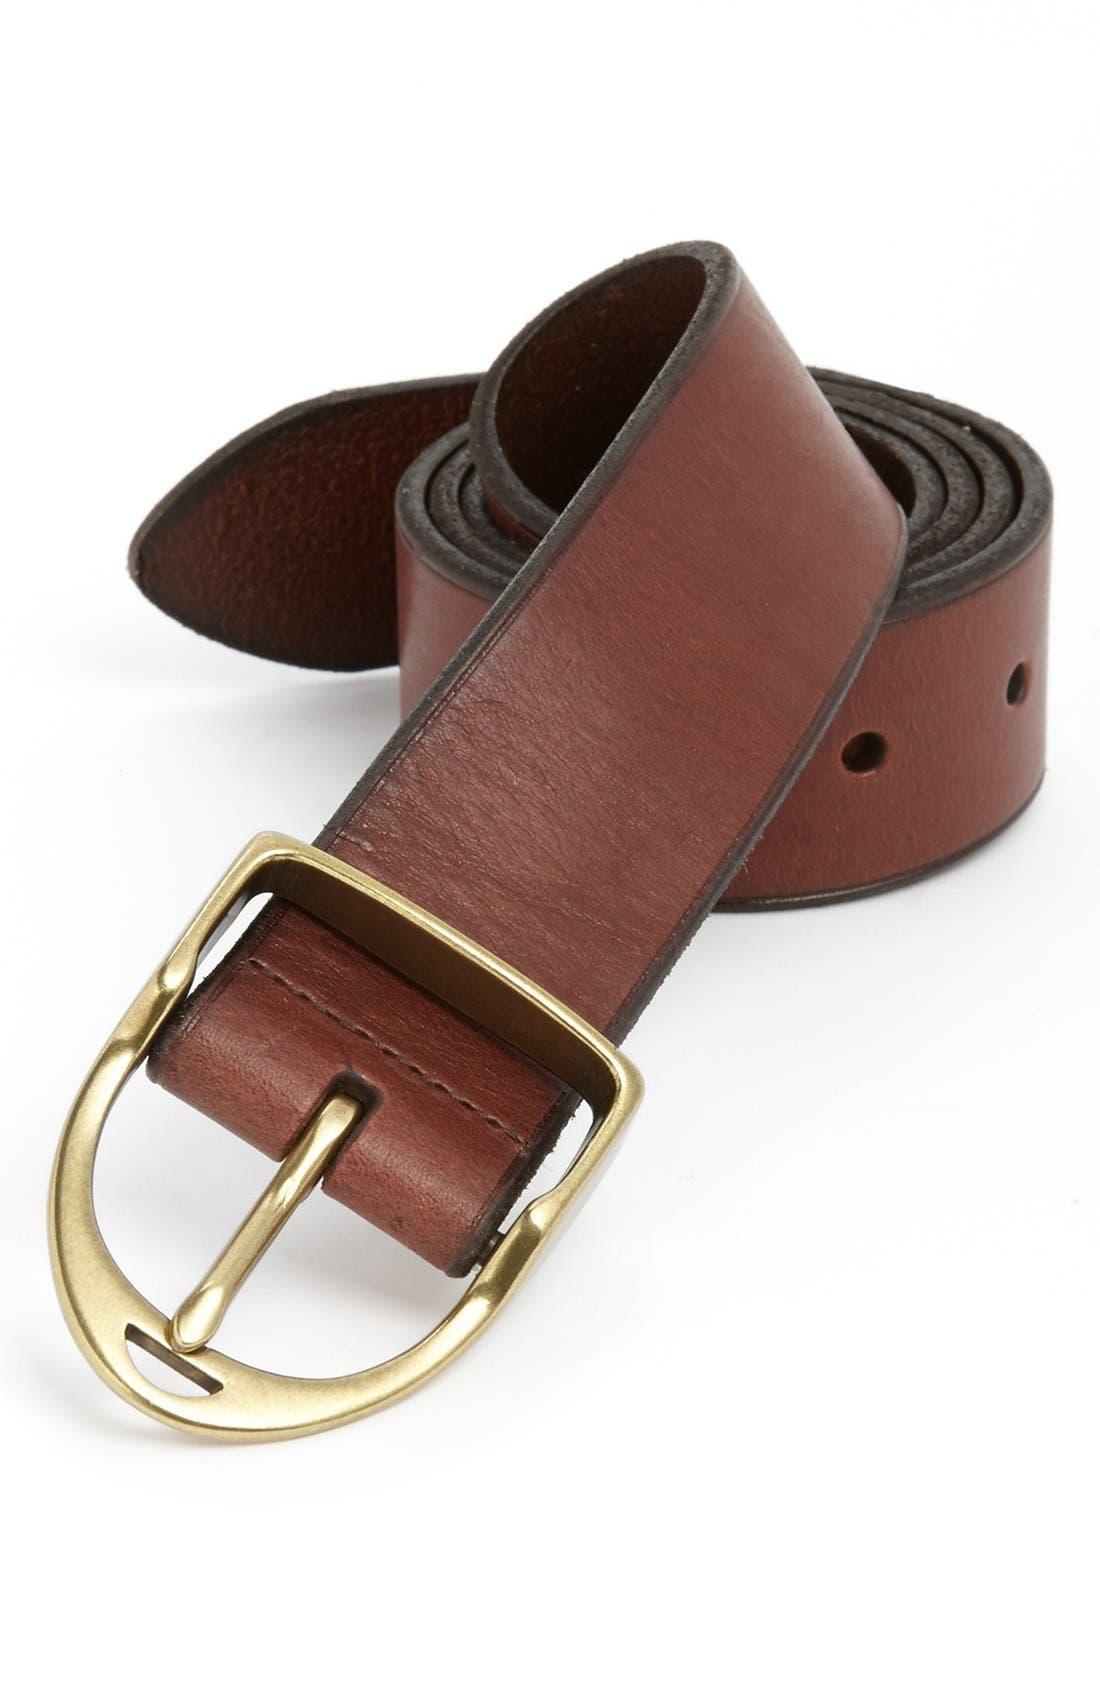 Alternate Image 1 Selected - Polo Ralph Lauren 'Wilton' Belt